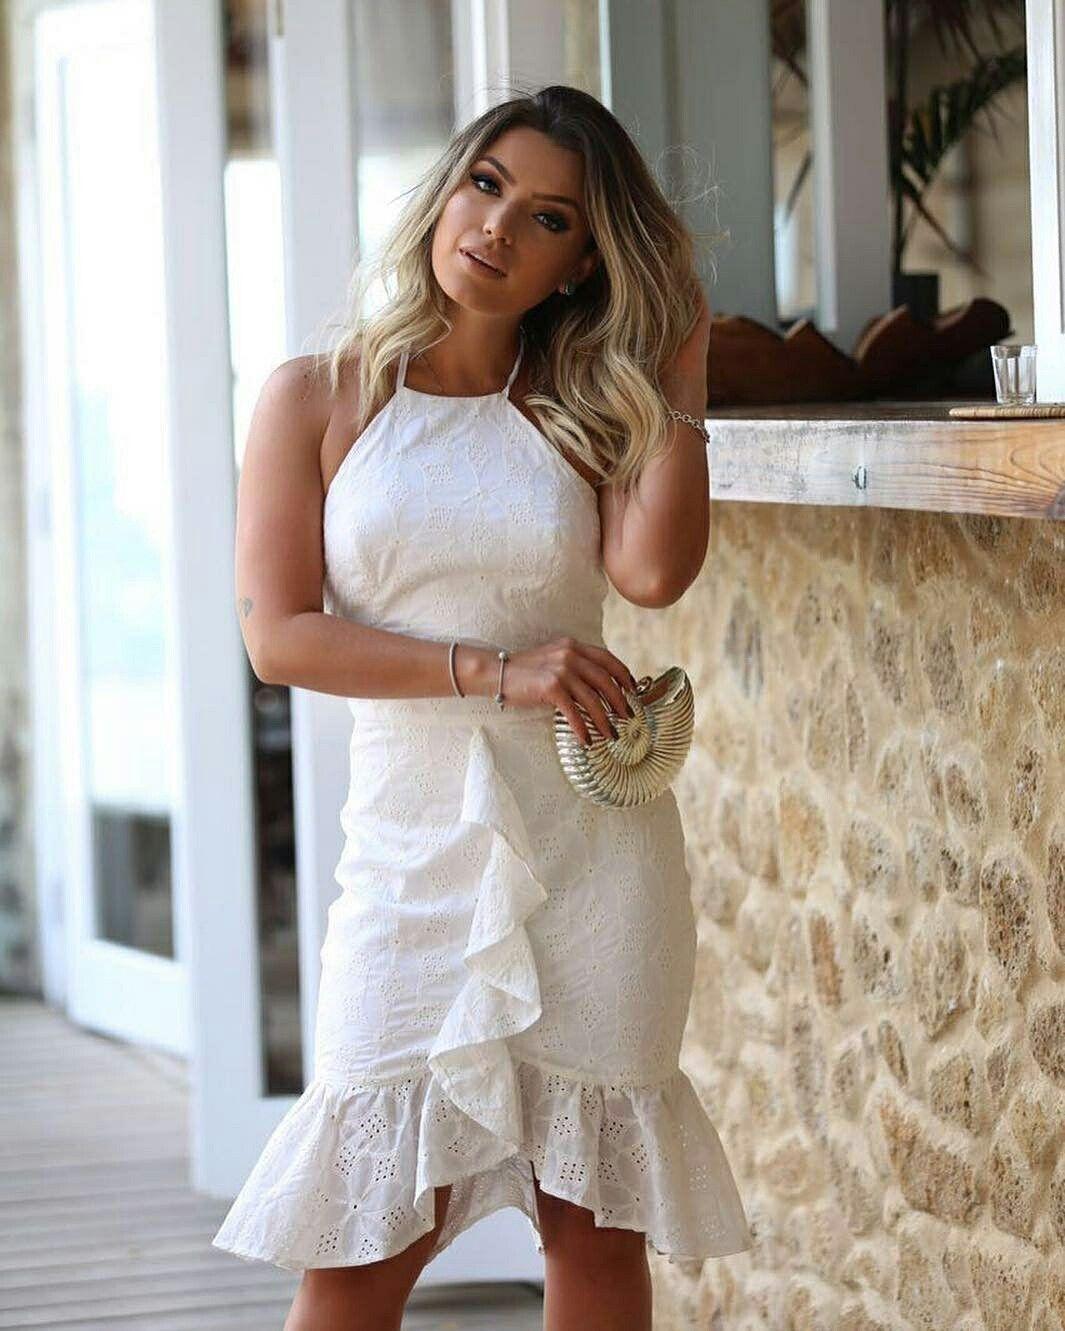 Bbw wedding dresses  stagramjeitodemeninahludptbrA